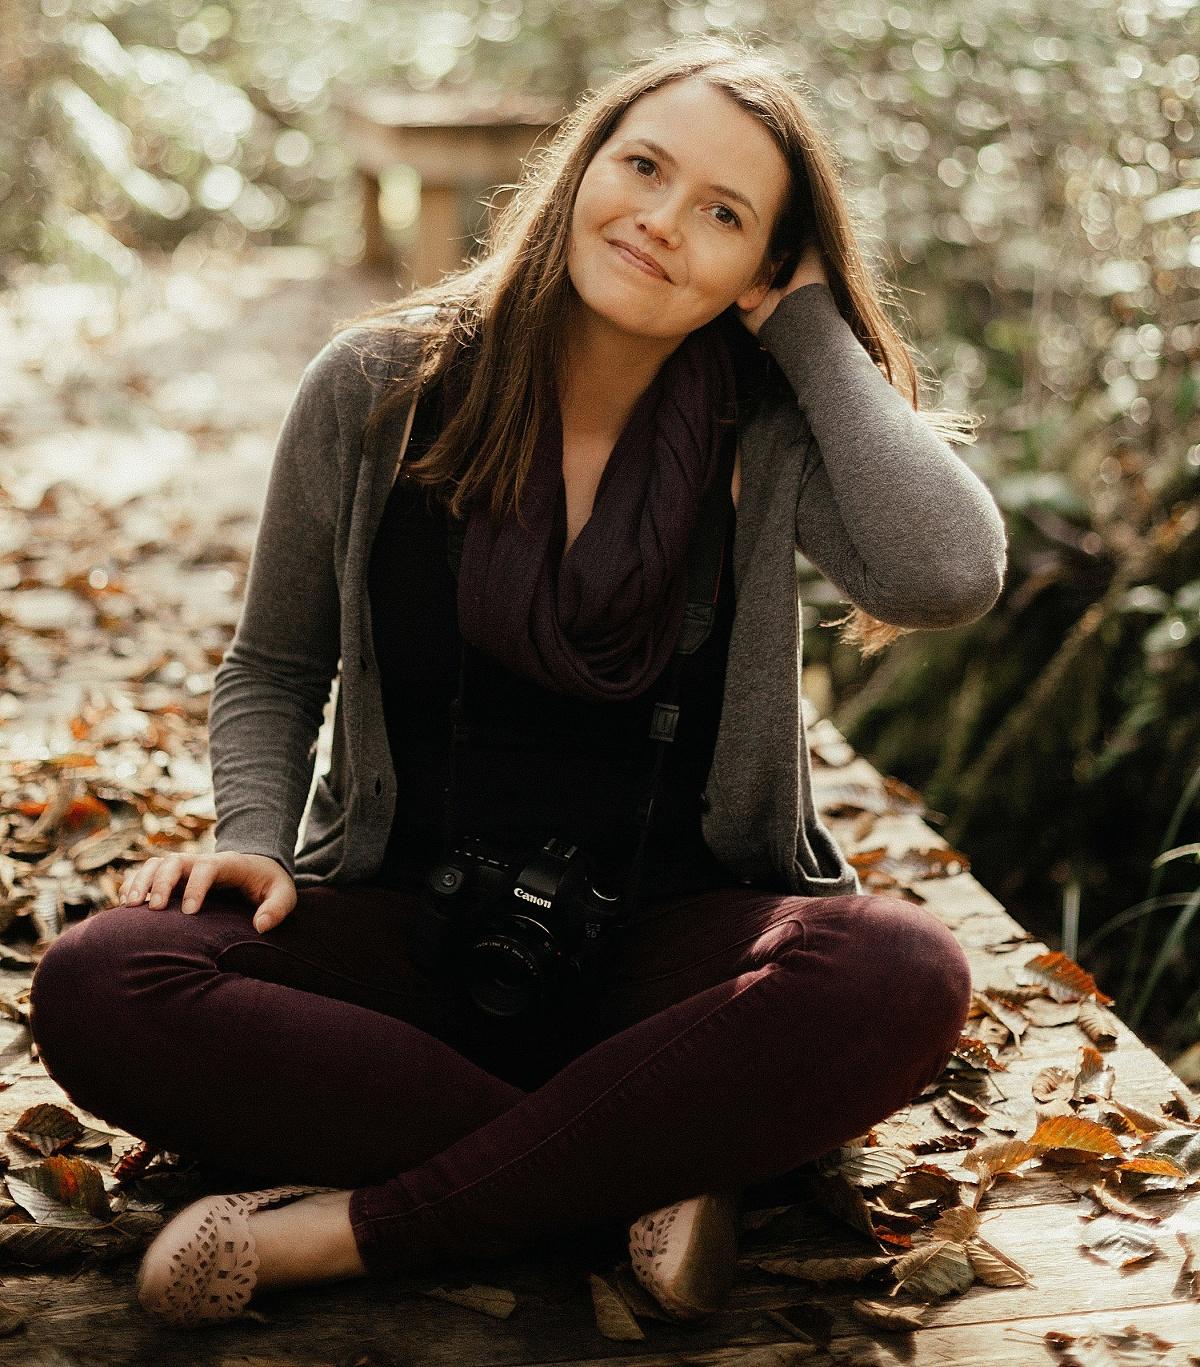 Sarah Rolles